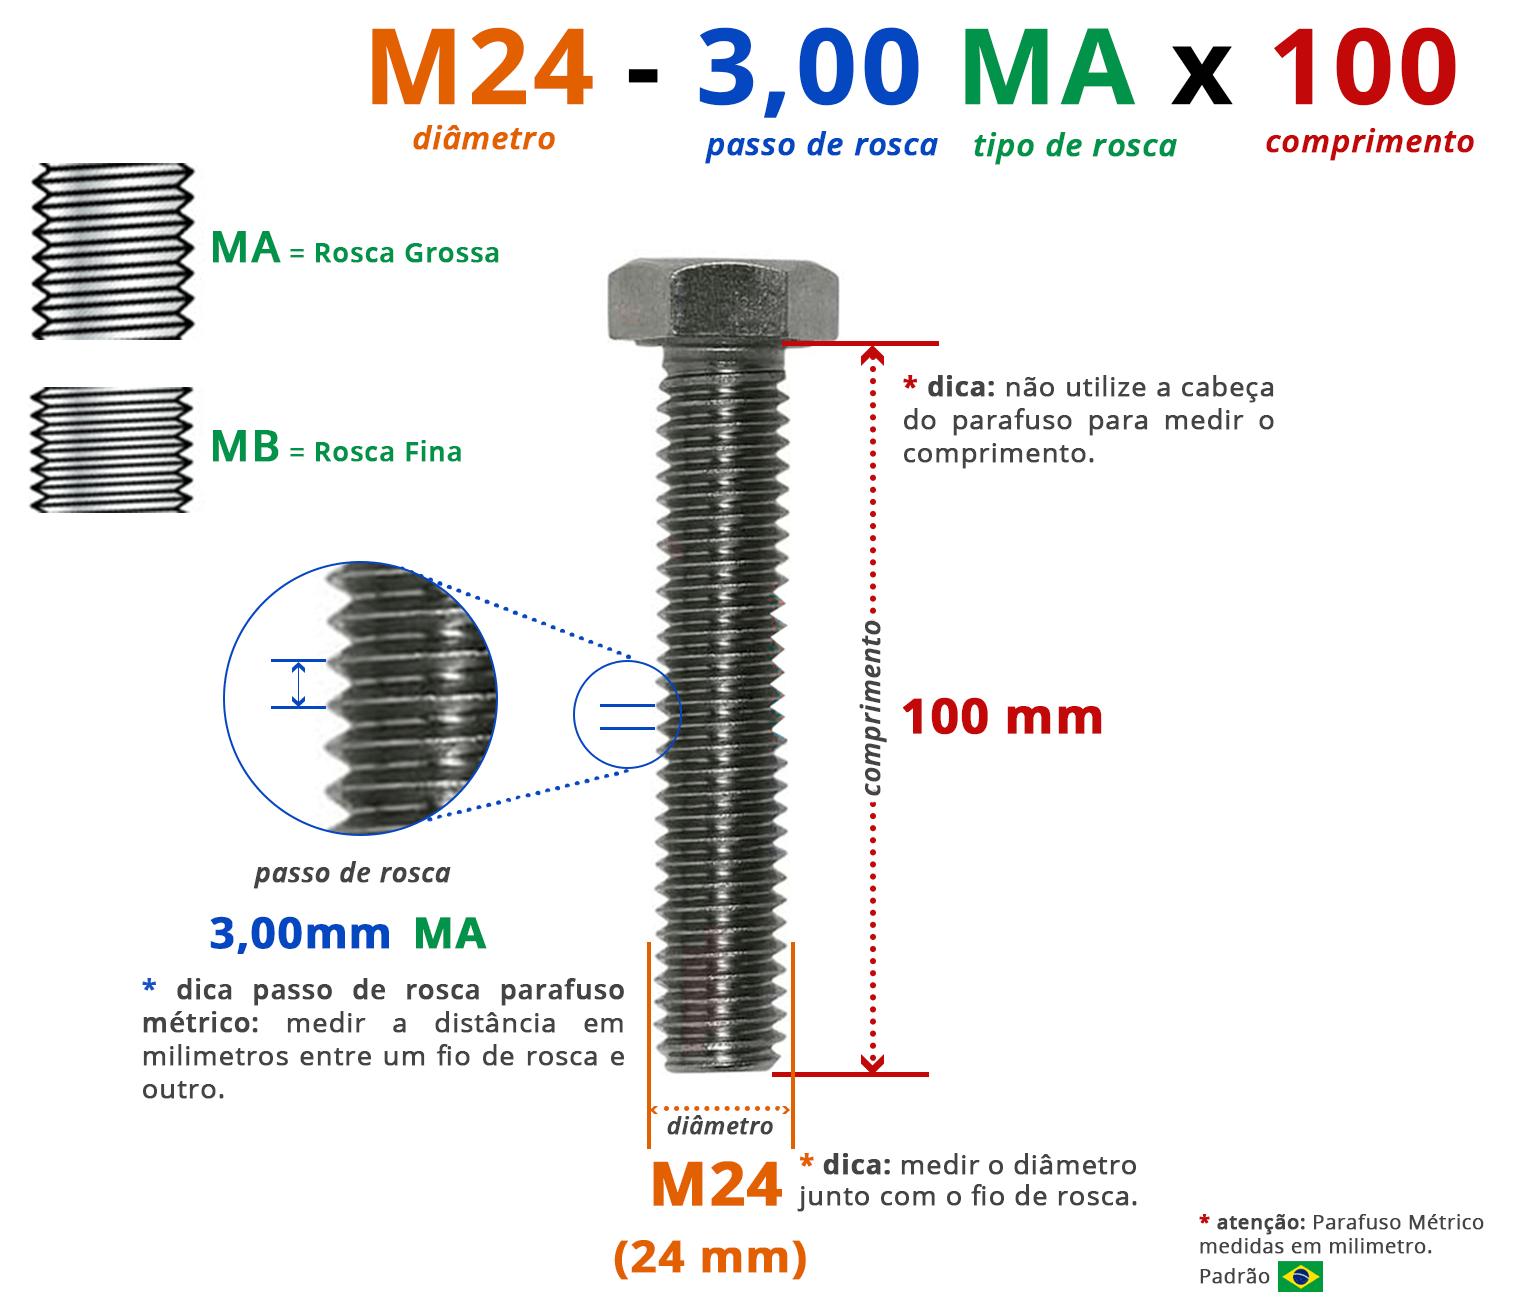 PARAFUSO SEXTAVADO ROSCA INTEIRA M24 3,00 MA X 100 DIN 933 INOX A4